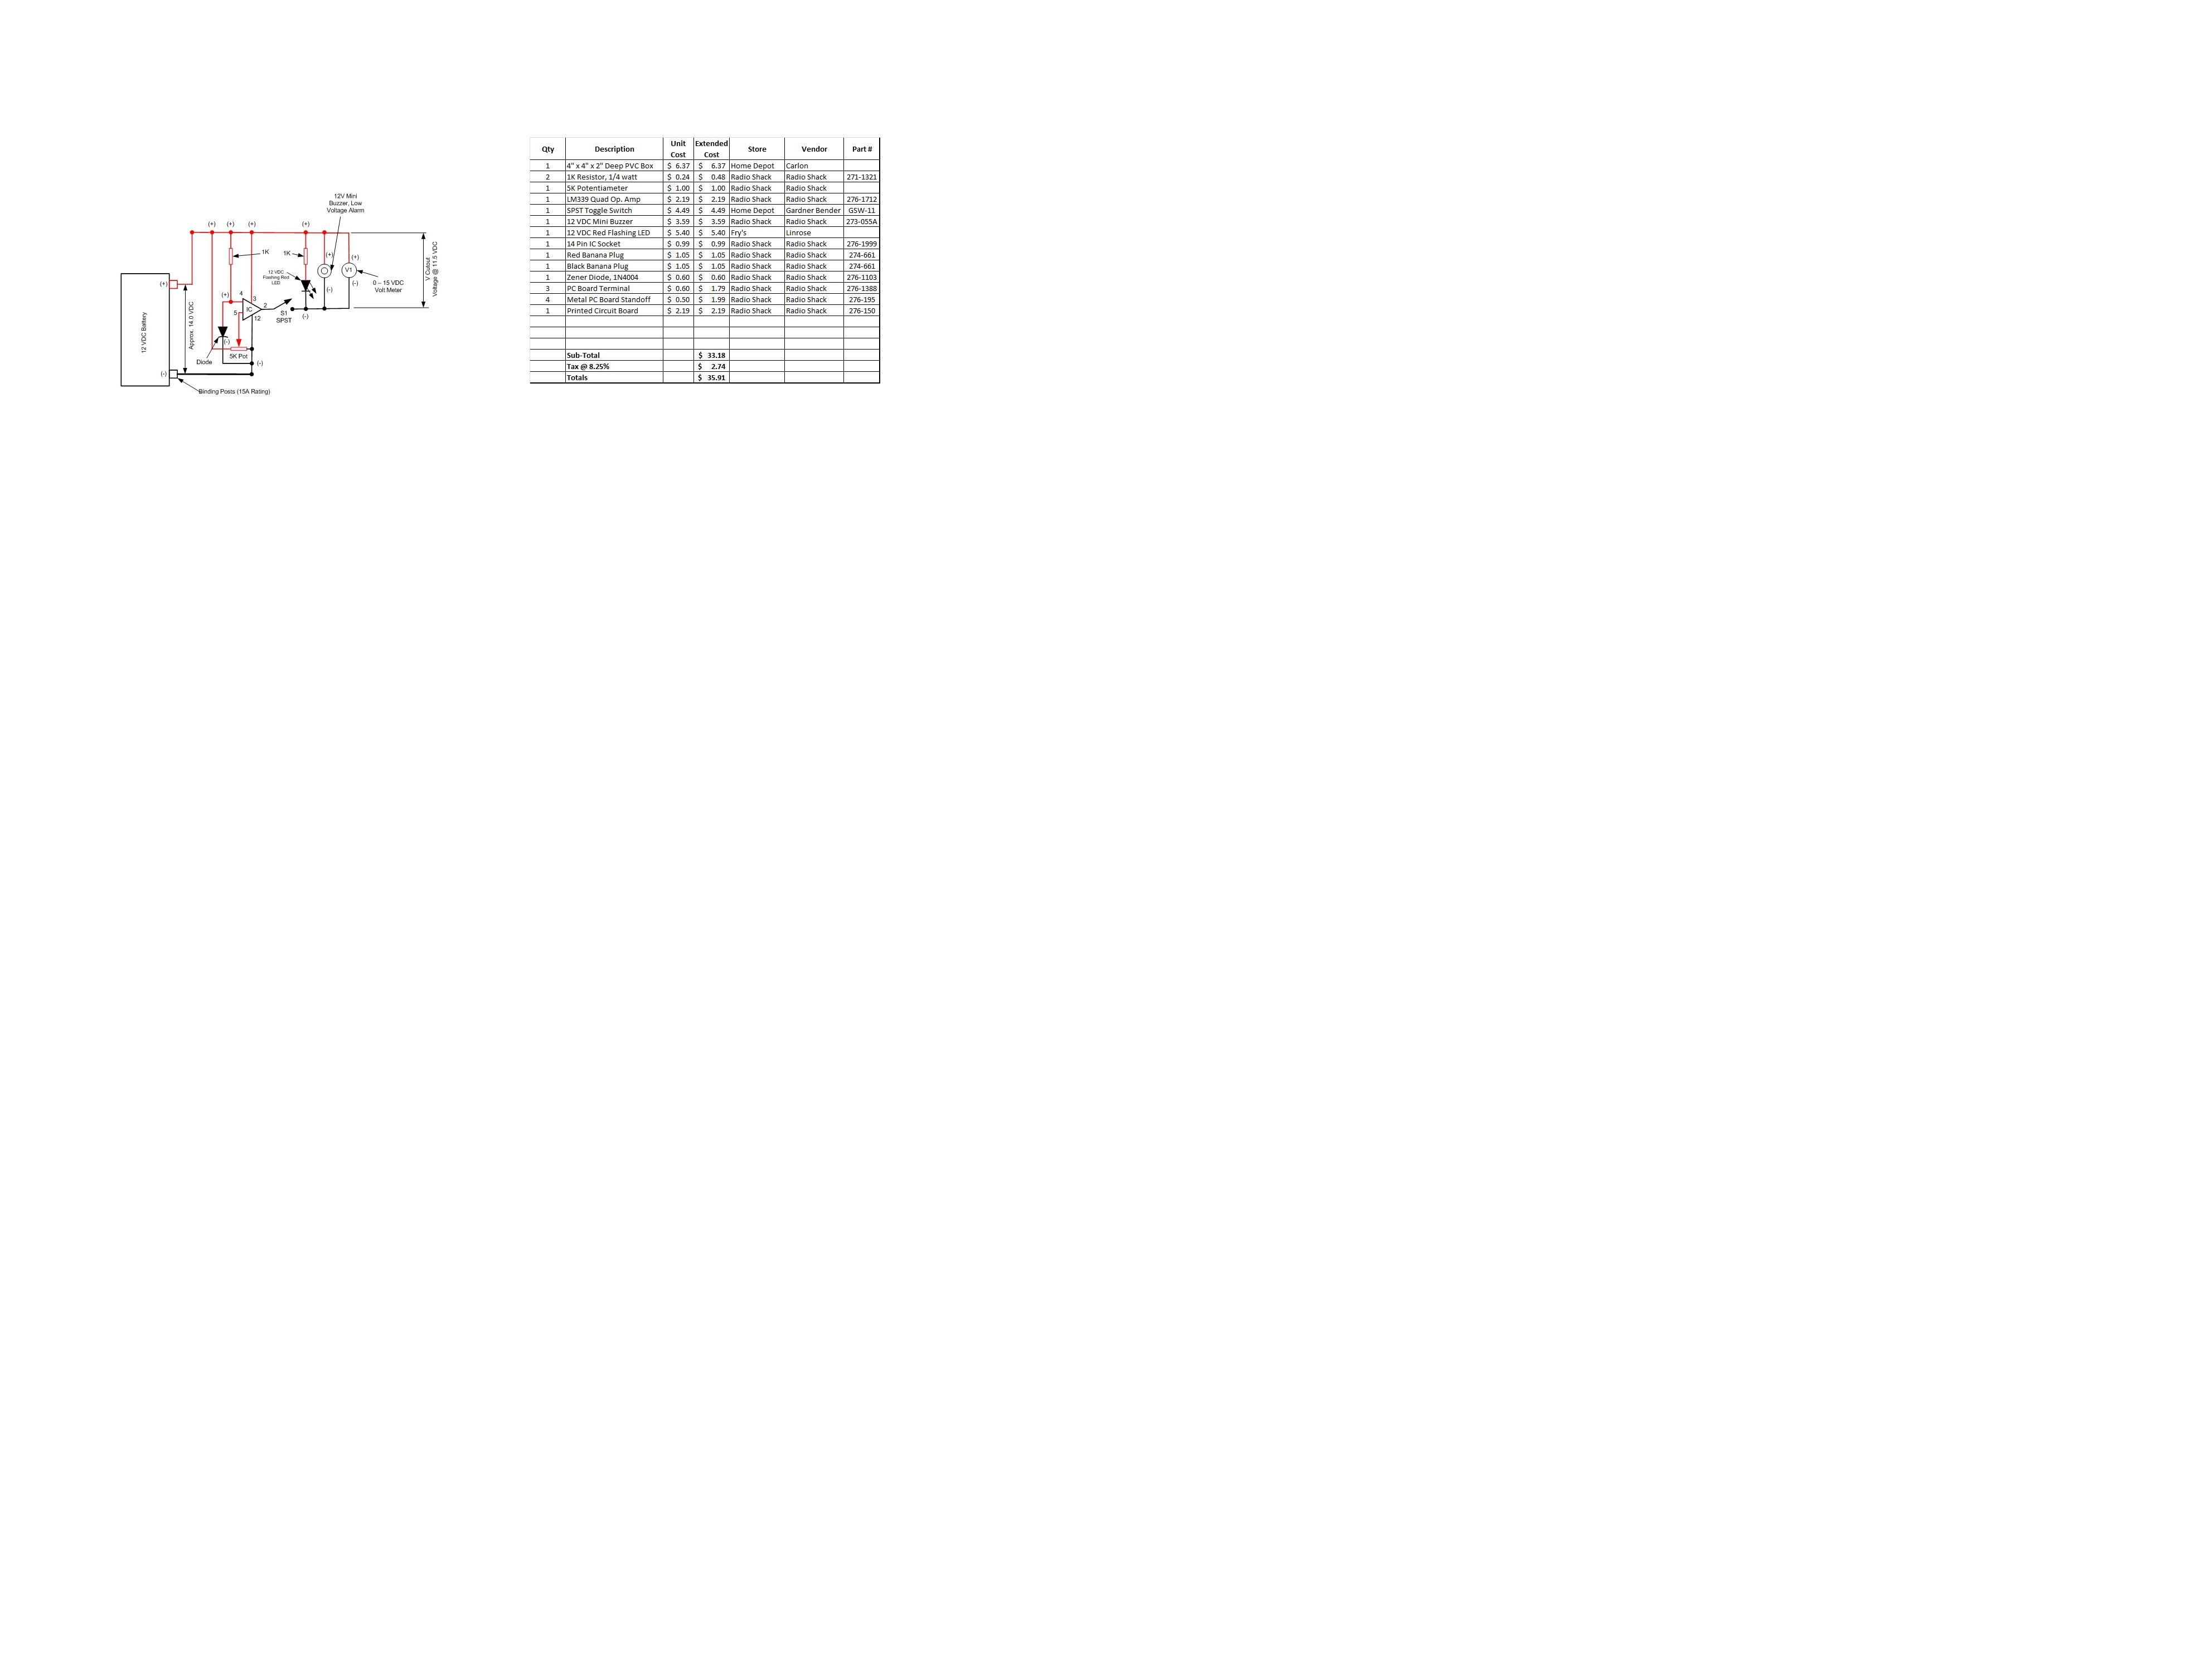 a2d15562-a352-43b4-8ed7-4b3224d84690_Voltage Comparator Circuit.jpg